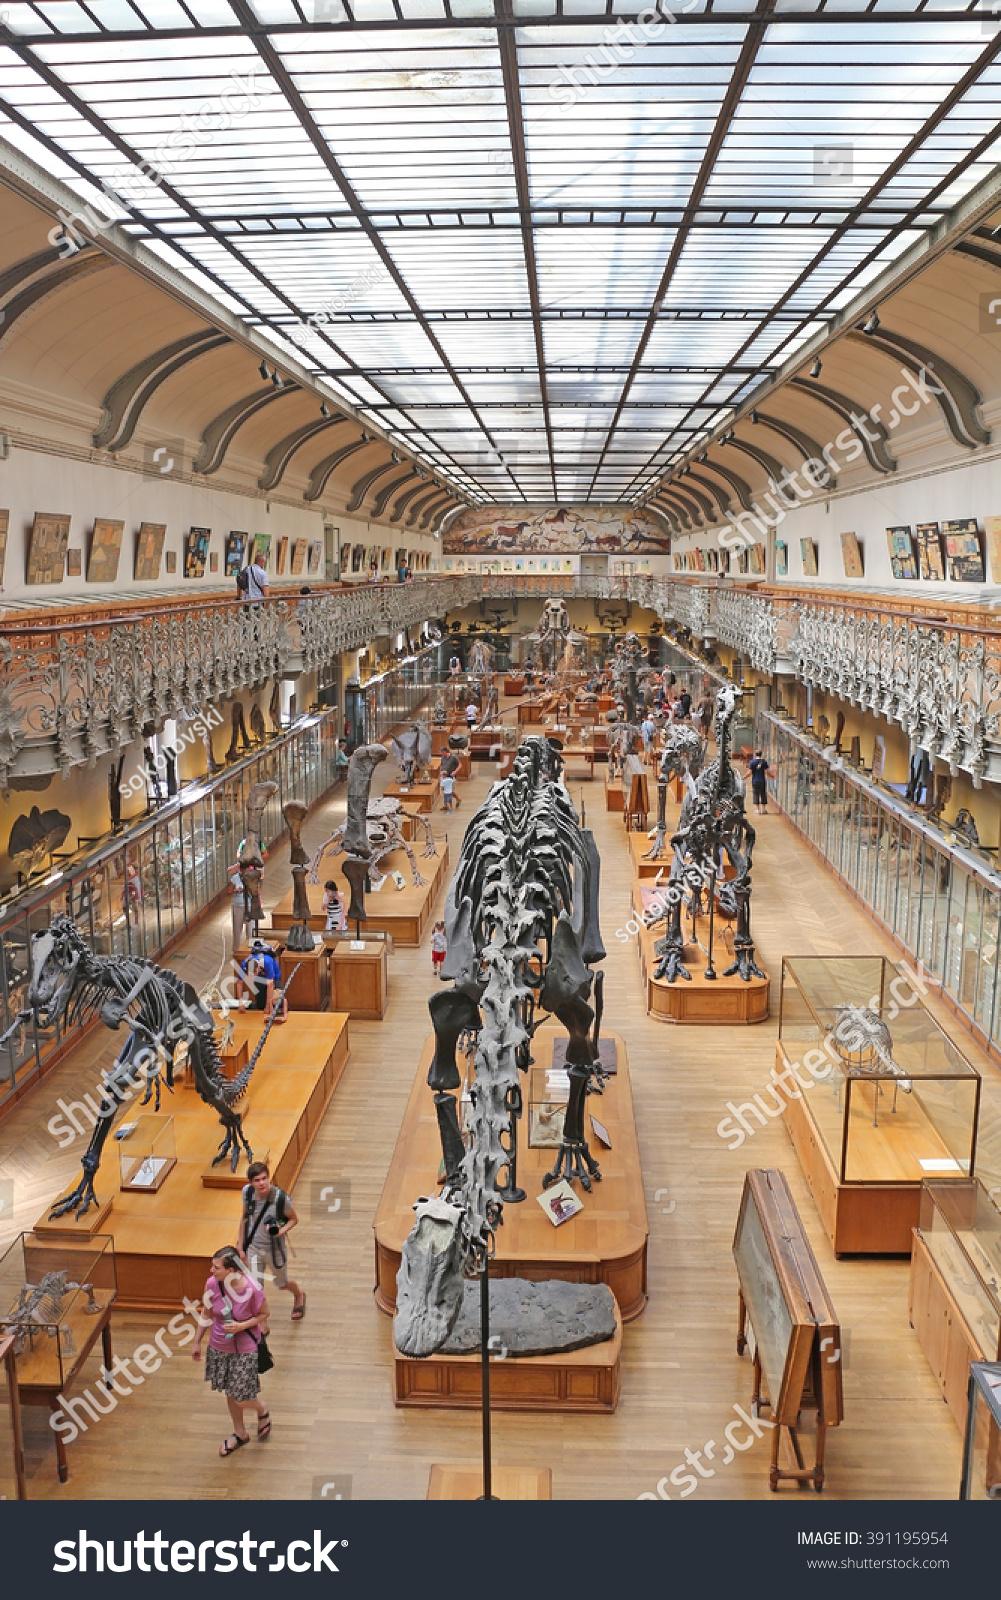 Gallery Paleontology Comparative Anatomy Paris August Stock Photo ...